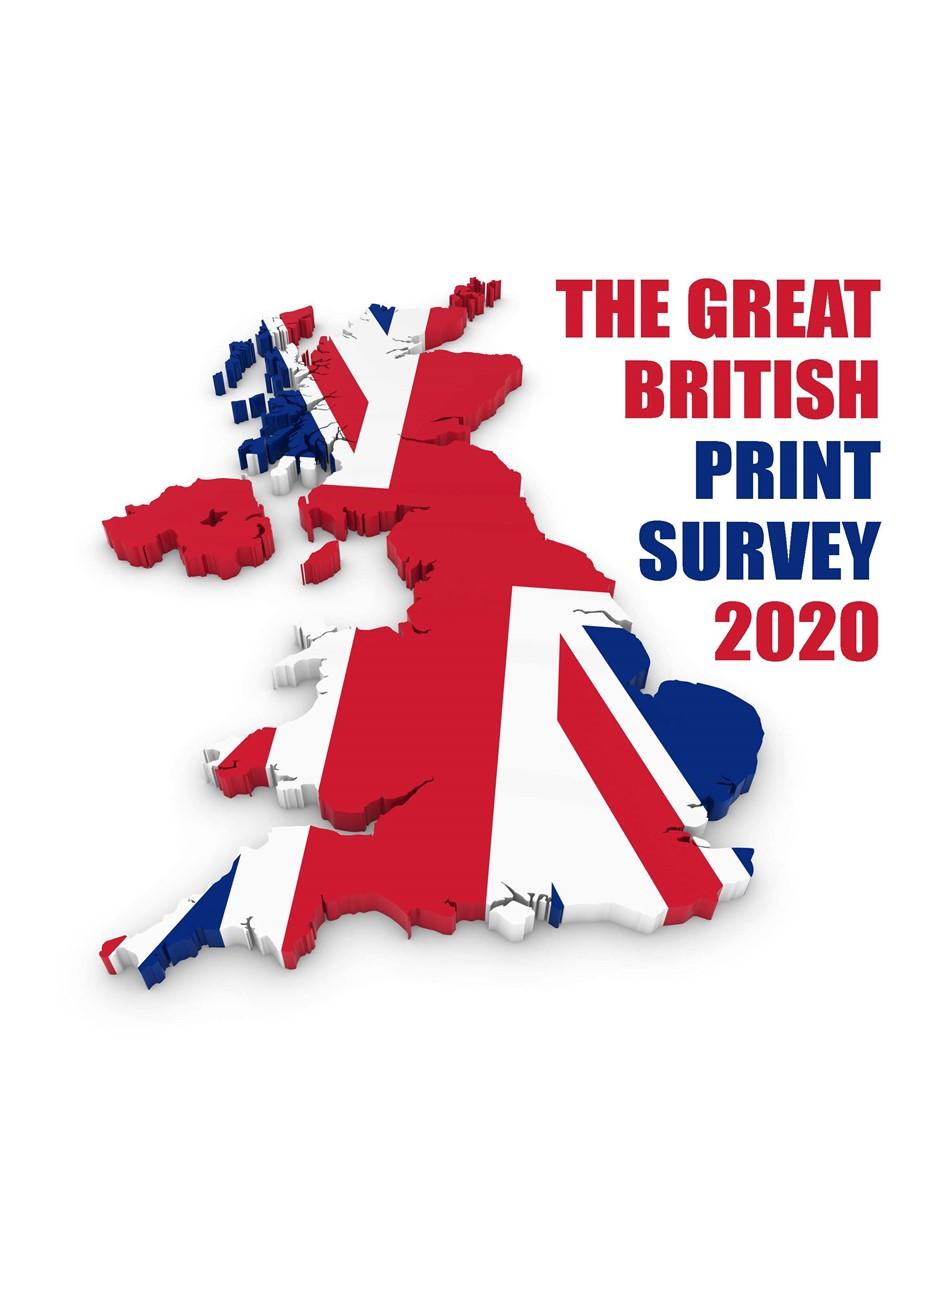 The Great British Print Survey - 2020